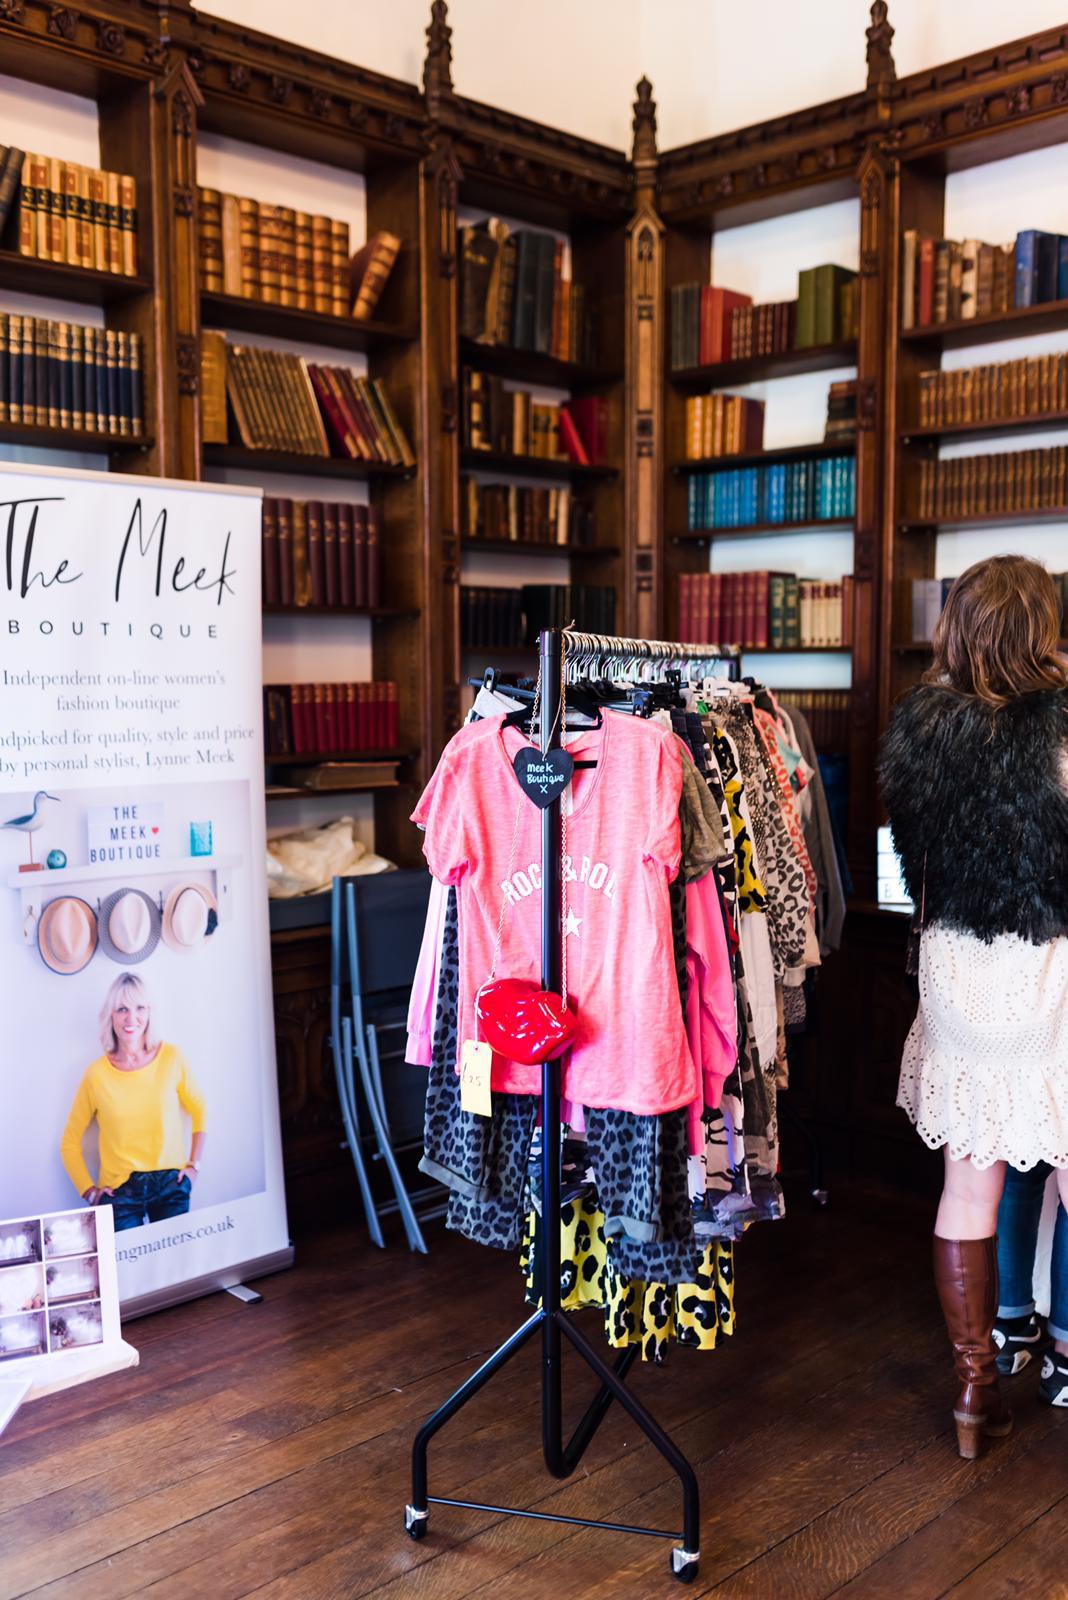 fashion-reboot-mums-the-word-event-tunbridge-wells-kent-support-local-magazine.JPG-0.JPG